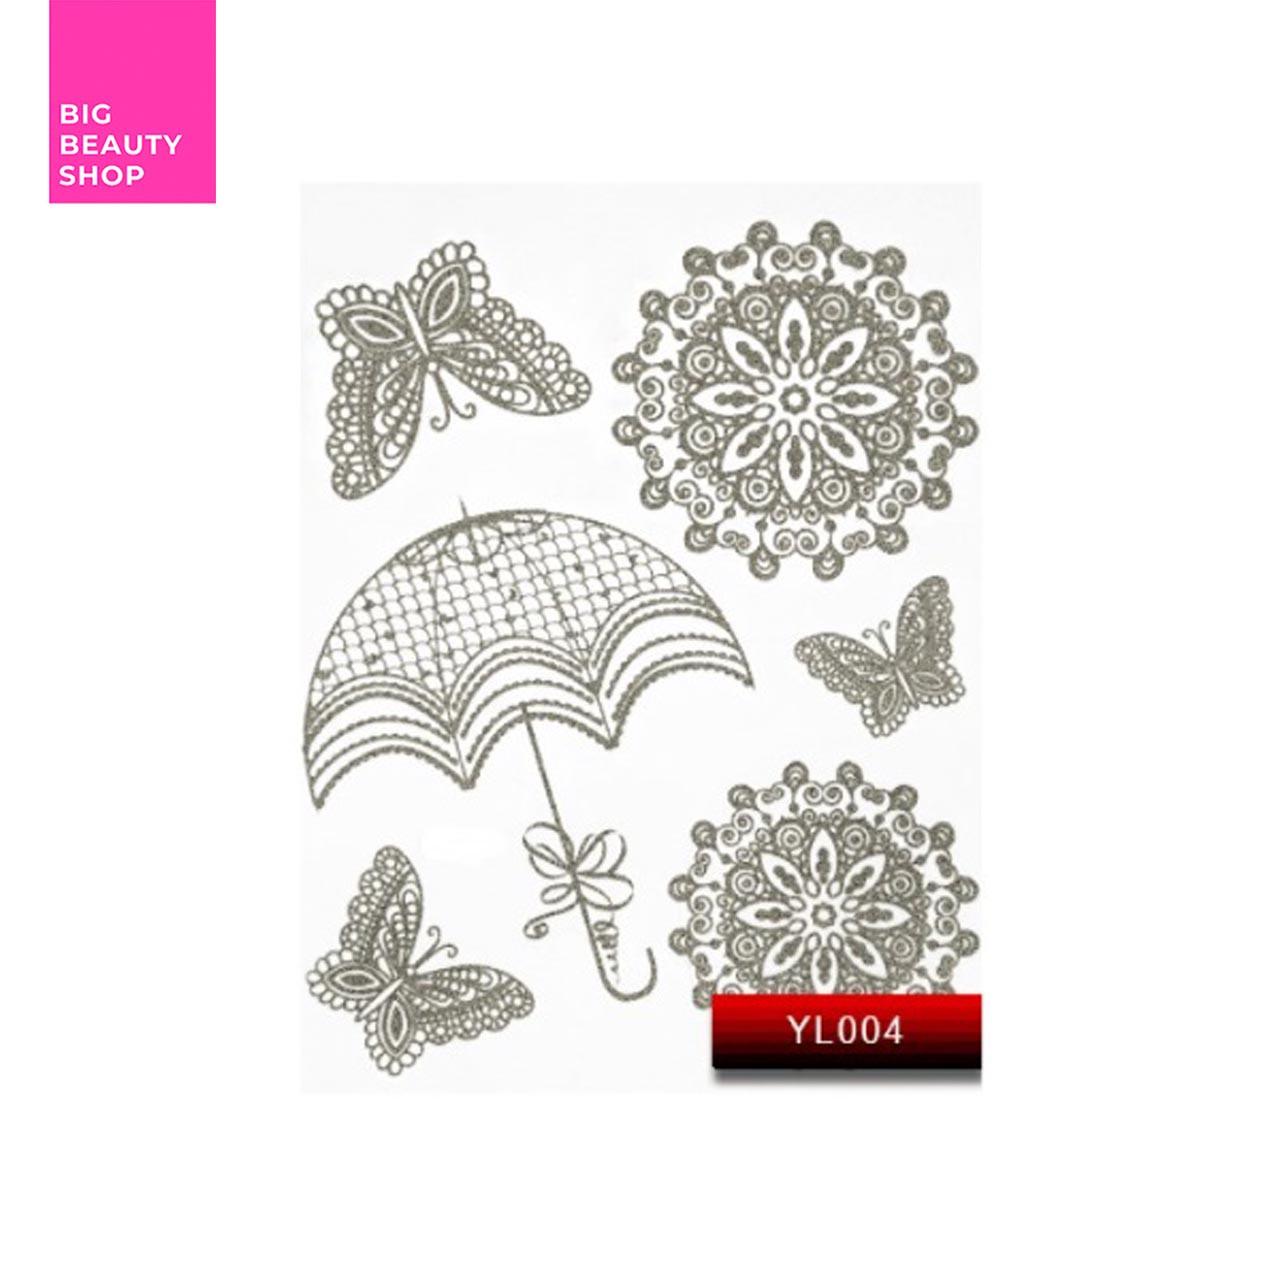 "Наклейка для дизайна ногтей Kodi Professional ""Silver"" Nail Art Stickers YL004"